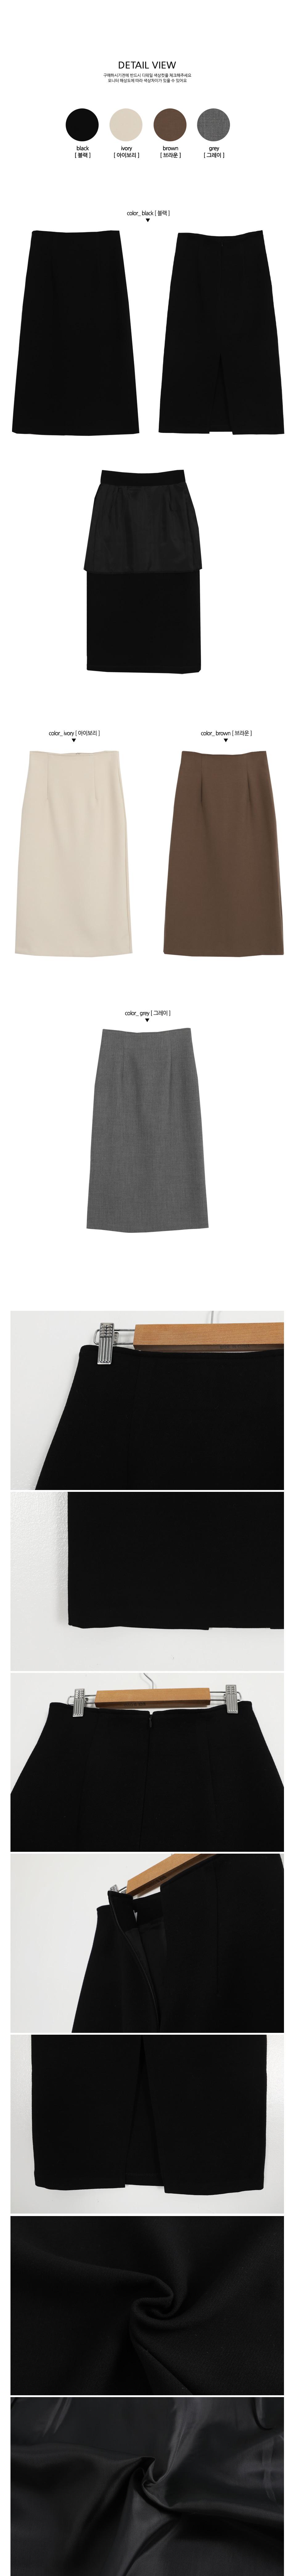 Tons H Long Skirt